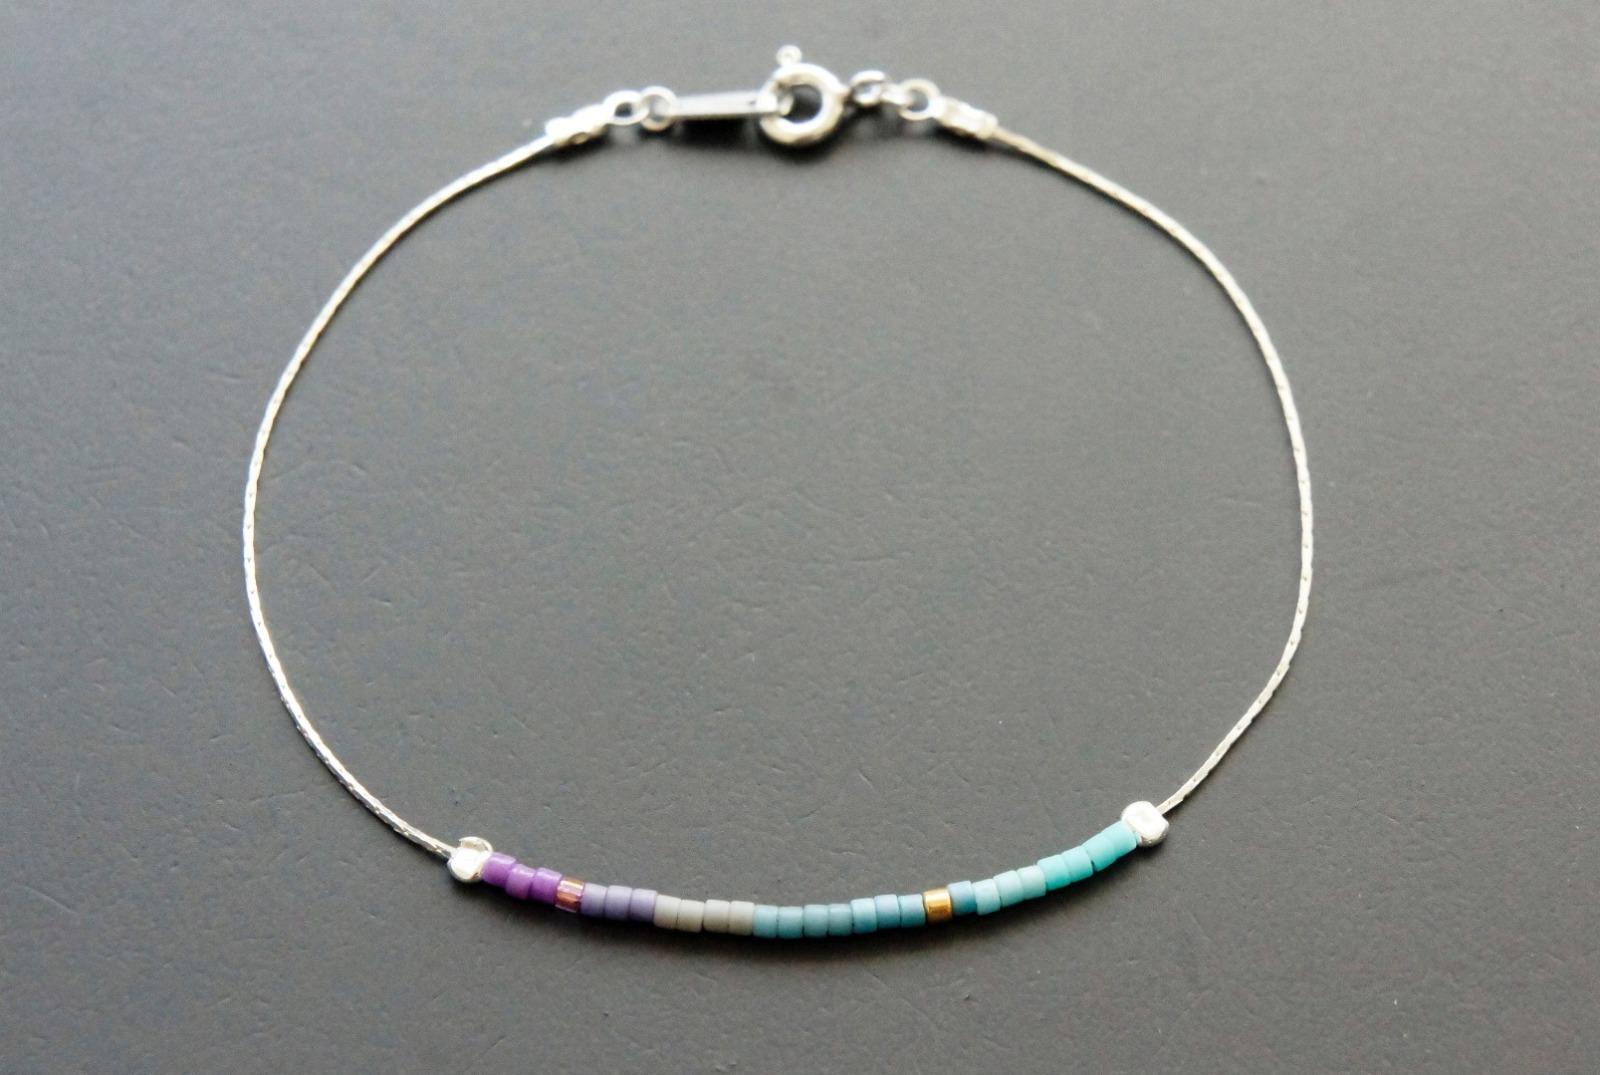 Filigranes Armband 925 Silber Verlauf lila-türkis - 2